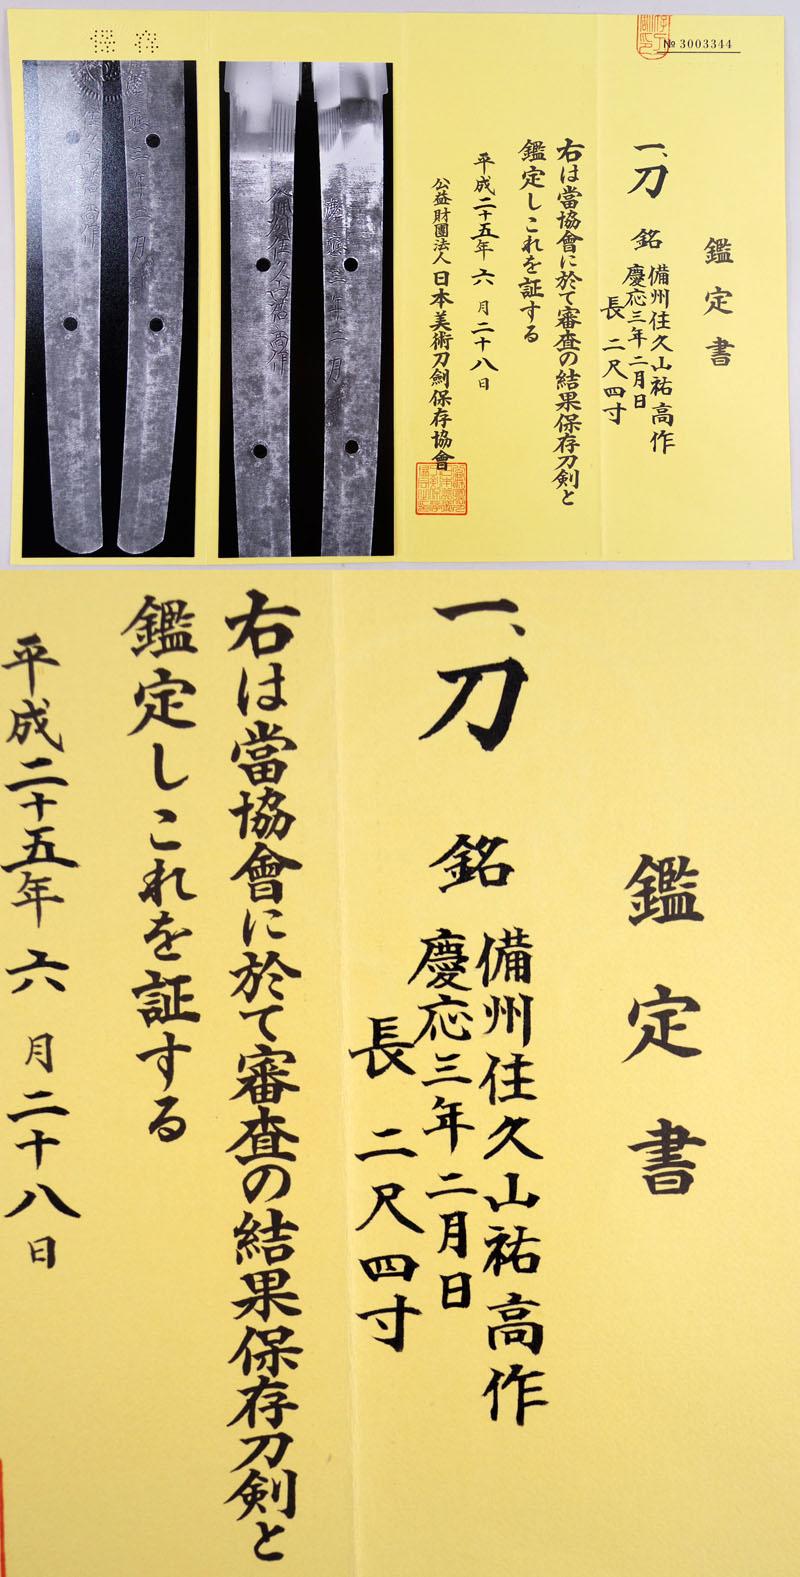 備州住久山祐高作 Picture of Certificate